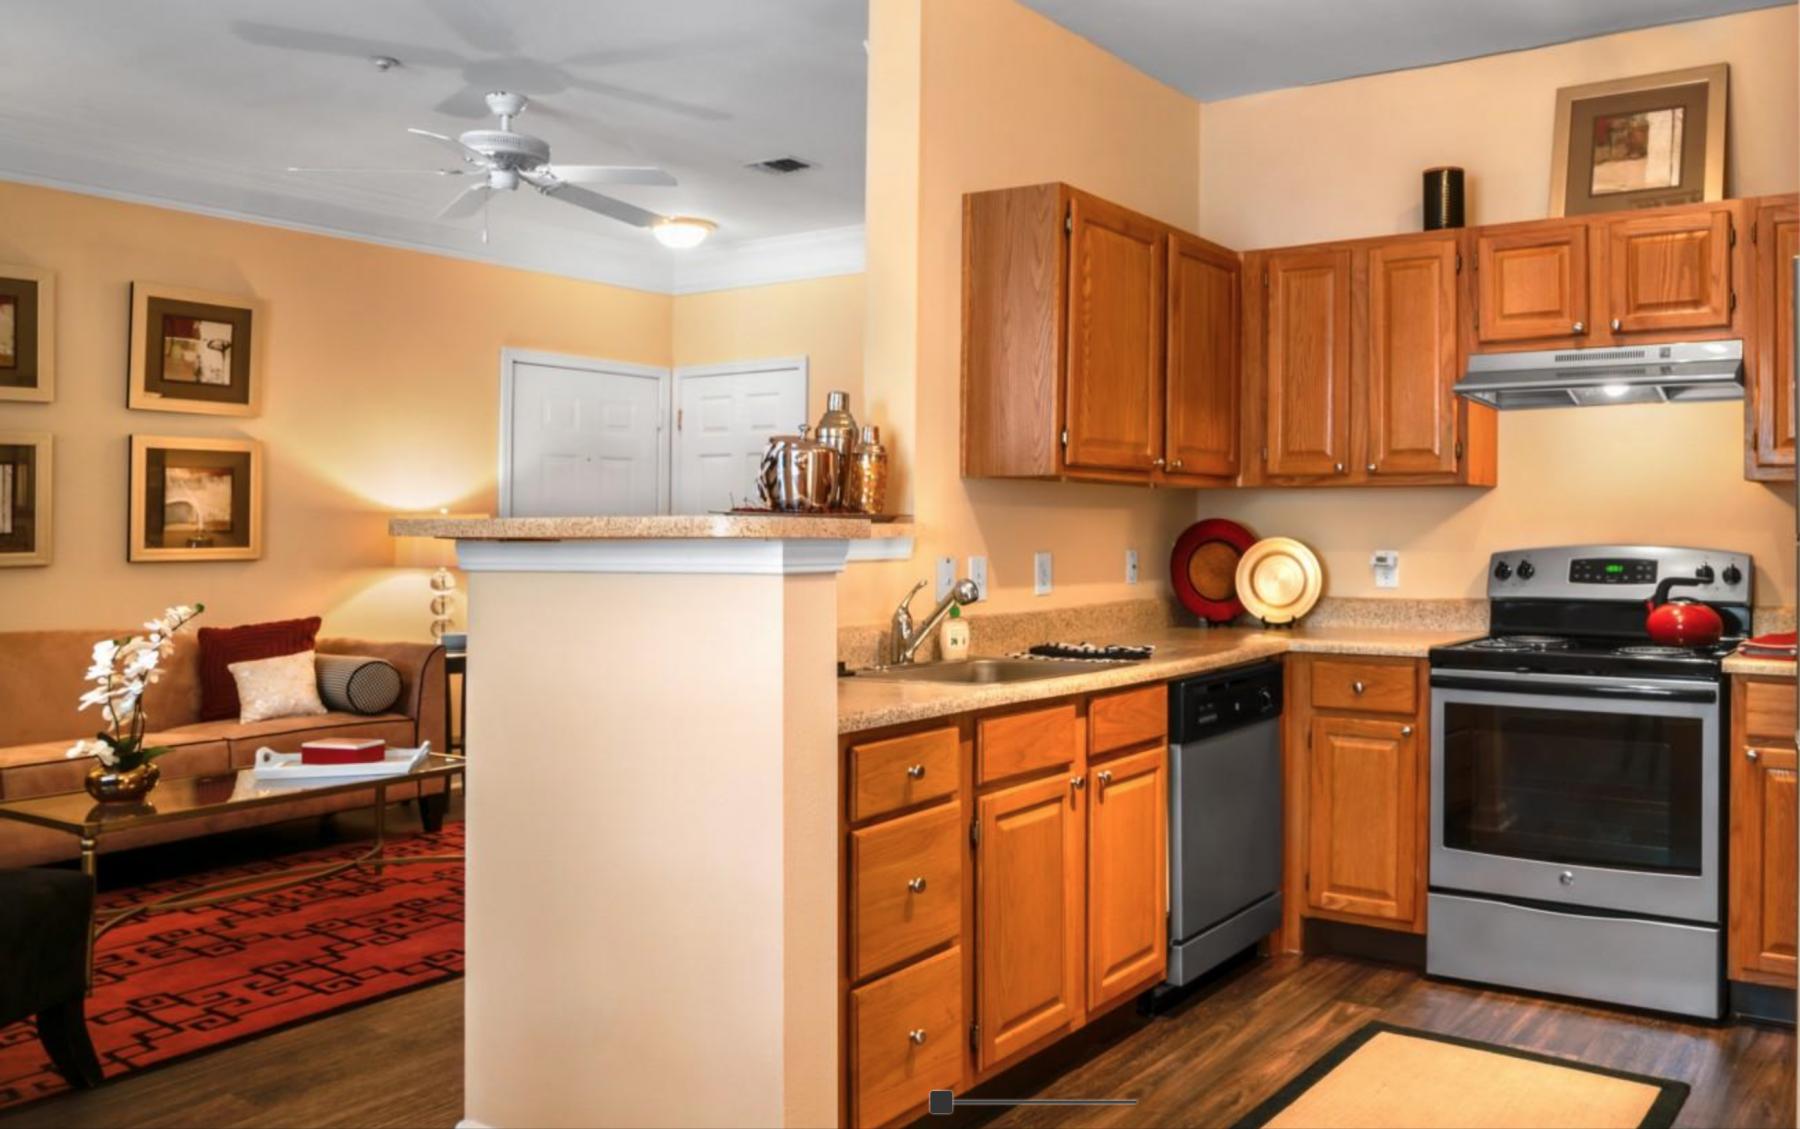 3 - Remodeled Kitchen copy